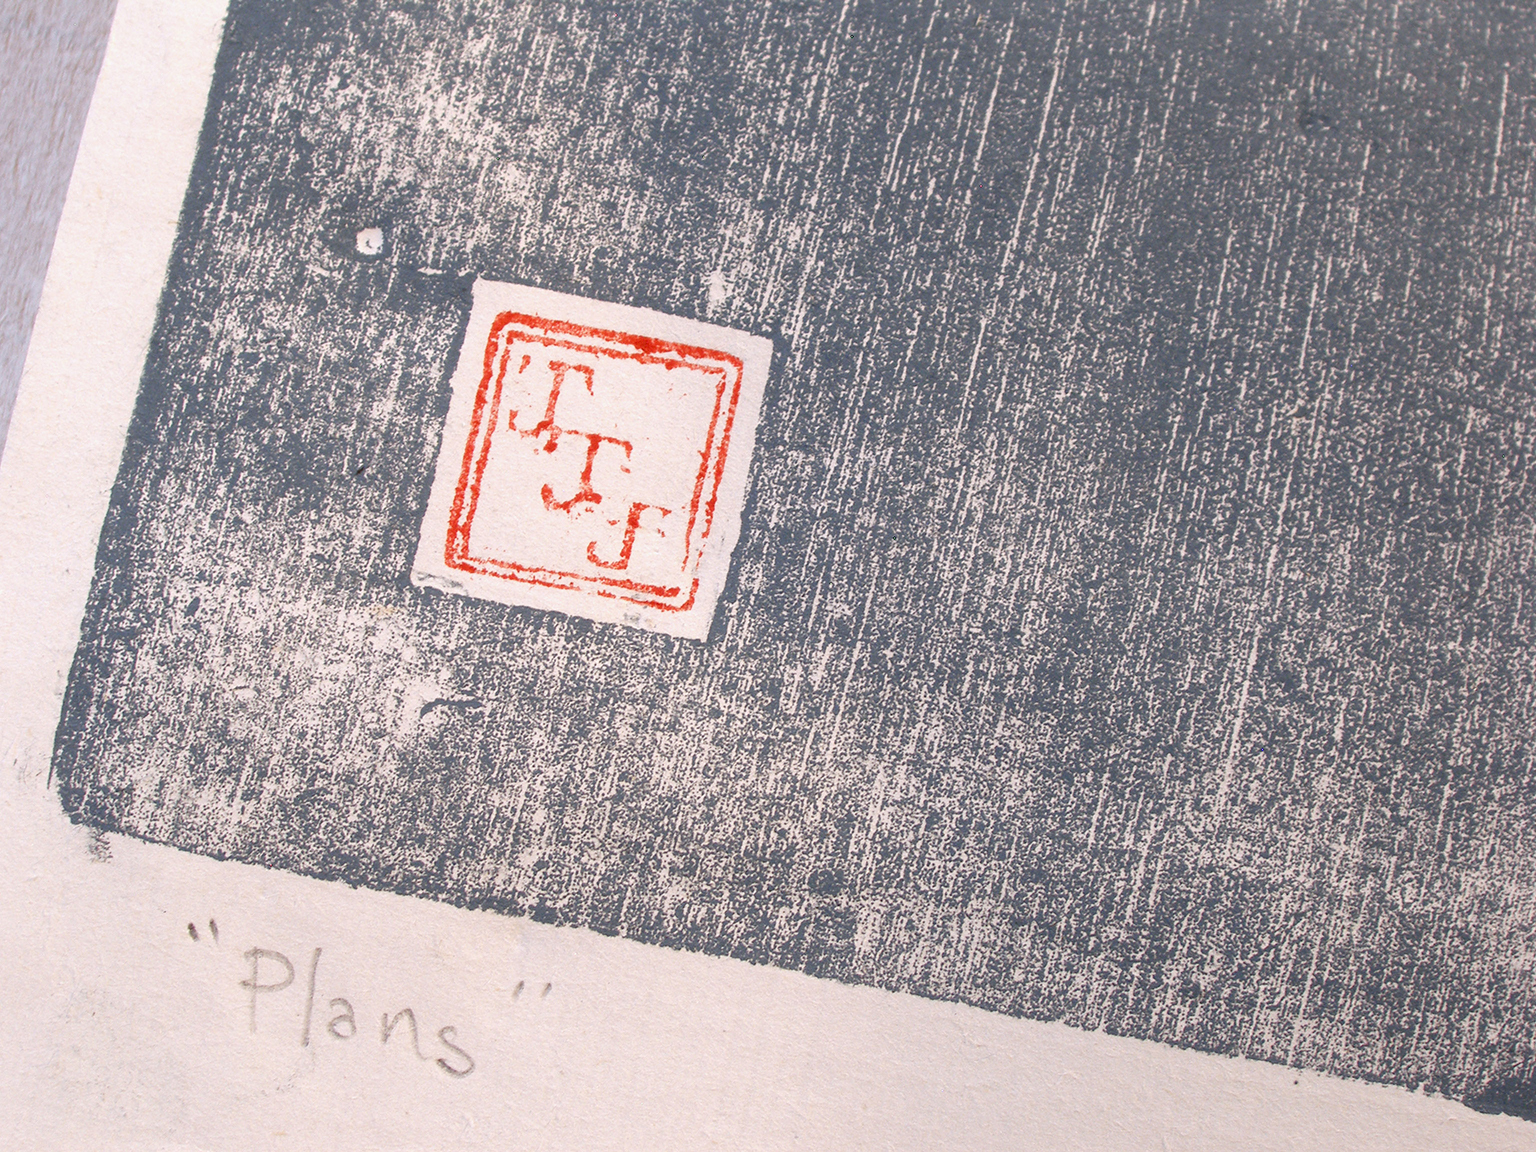 plans gray stamp.jpg